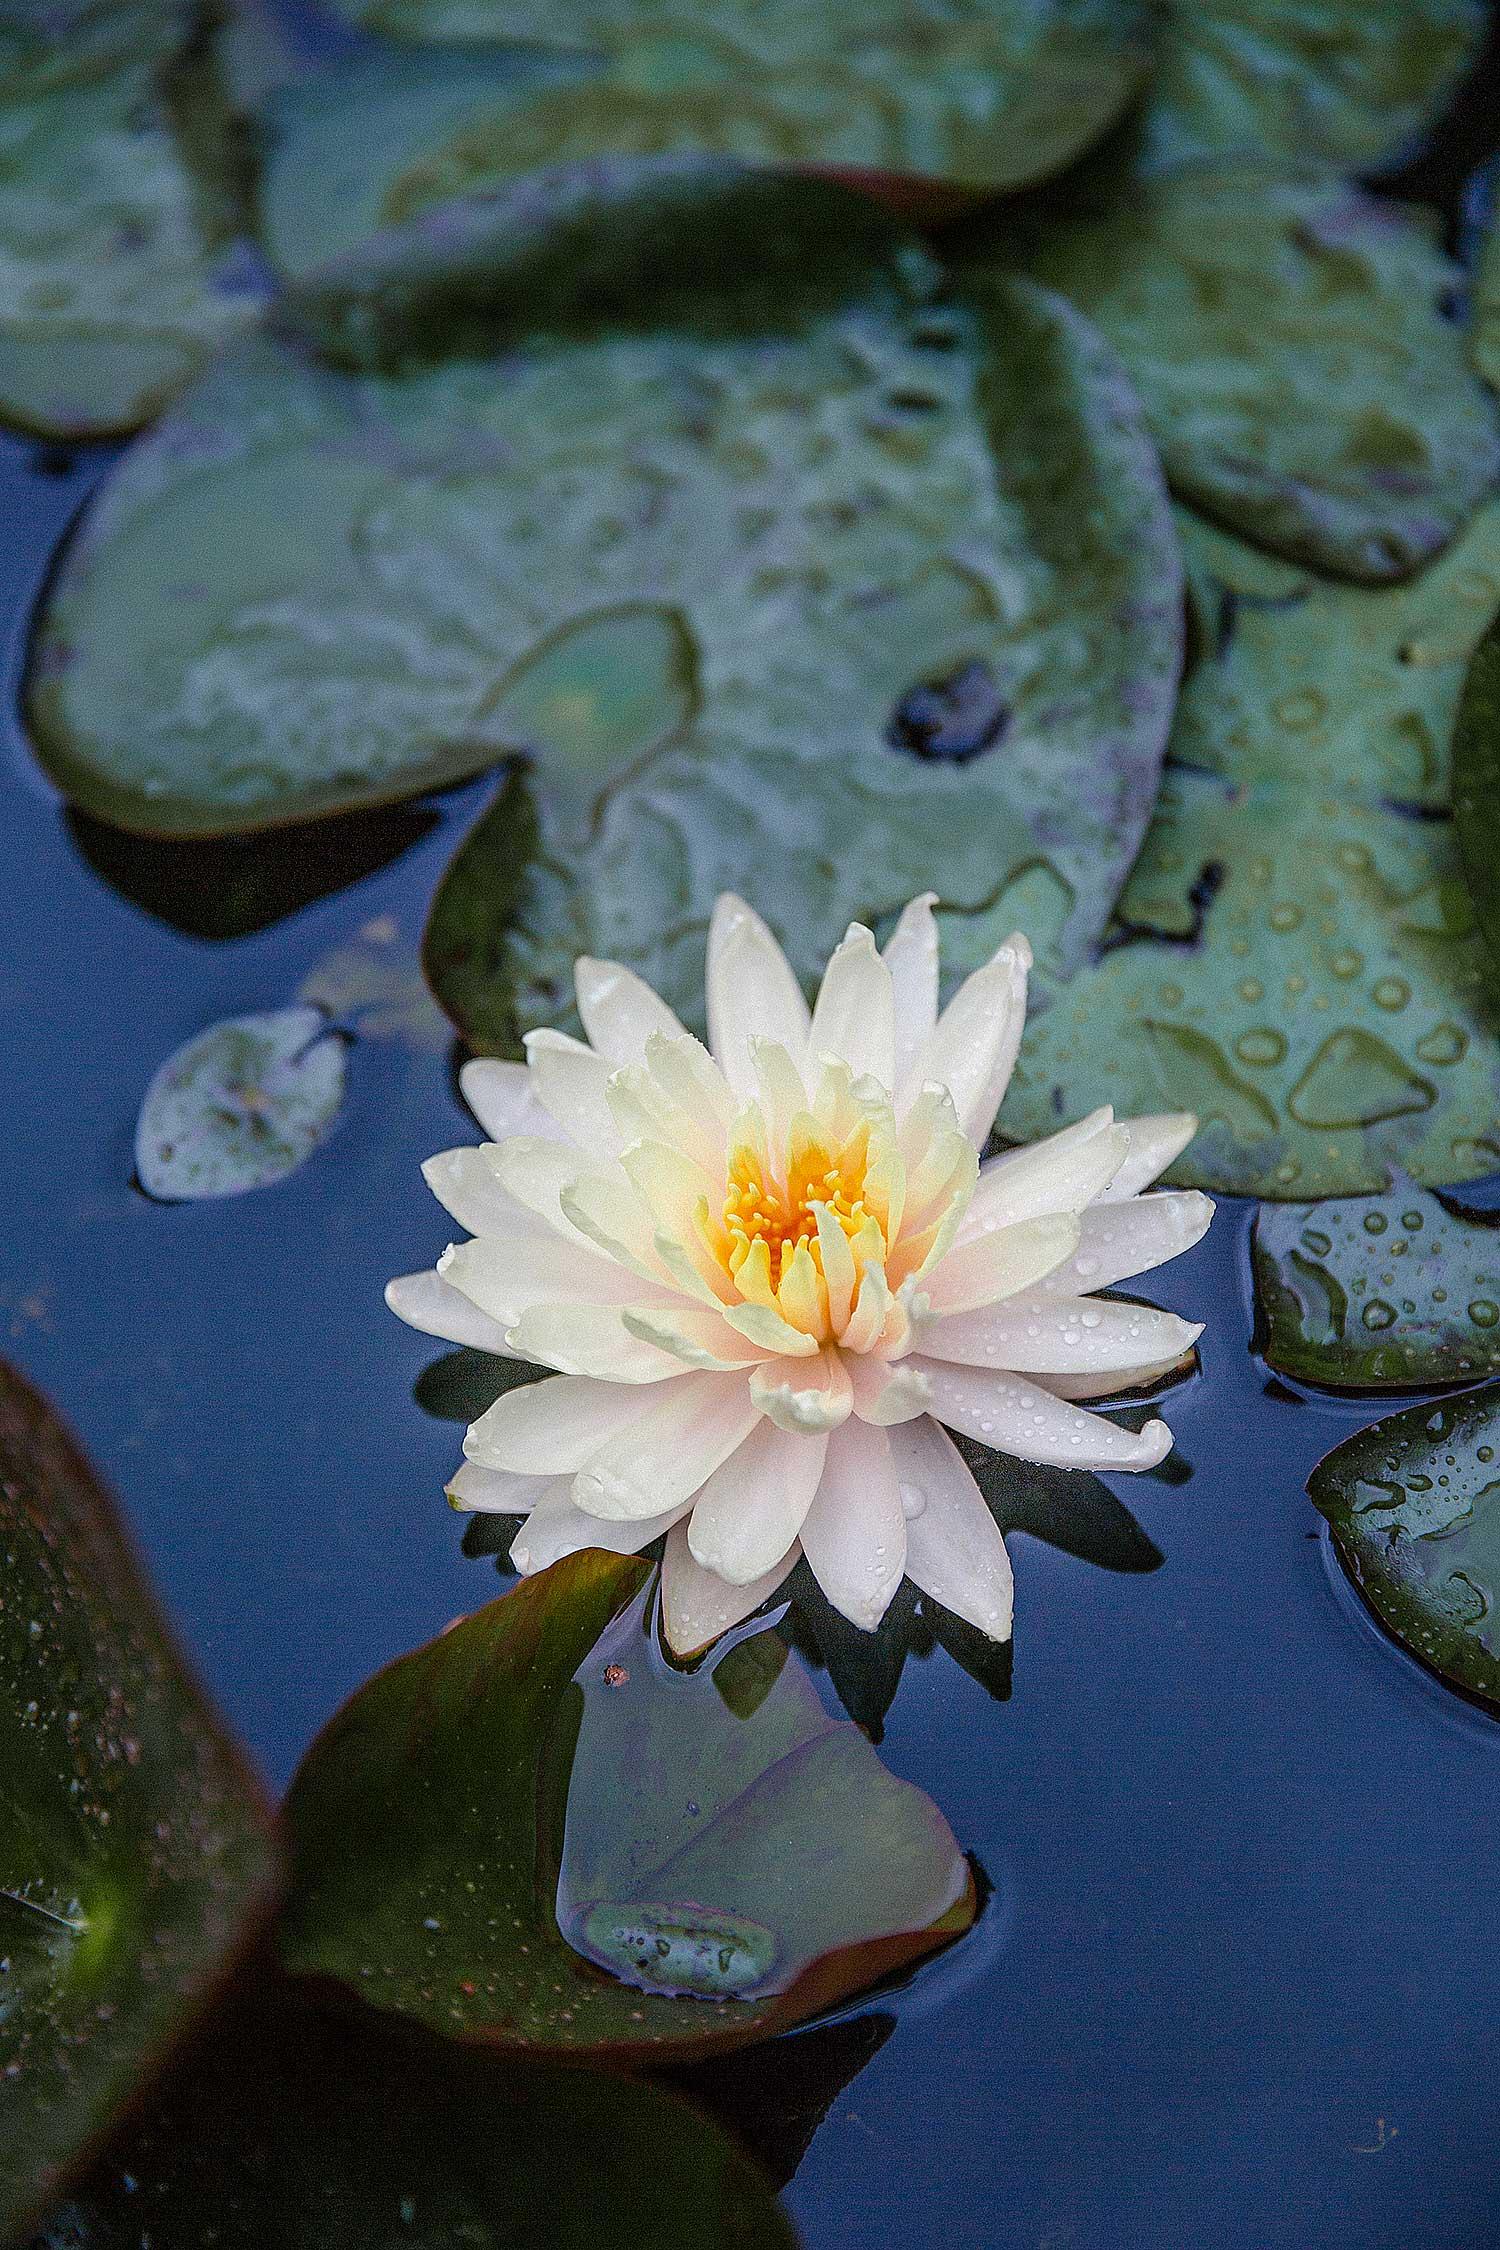 Villa Taranto Botanical Gardens Lake Maggiore Italy